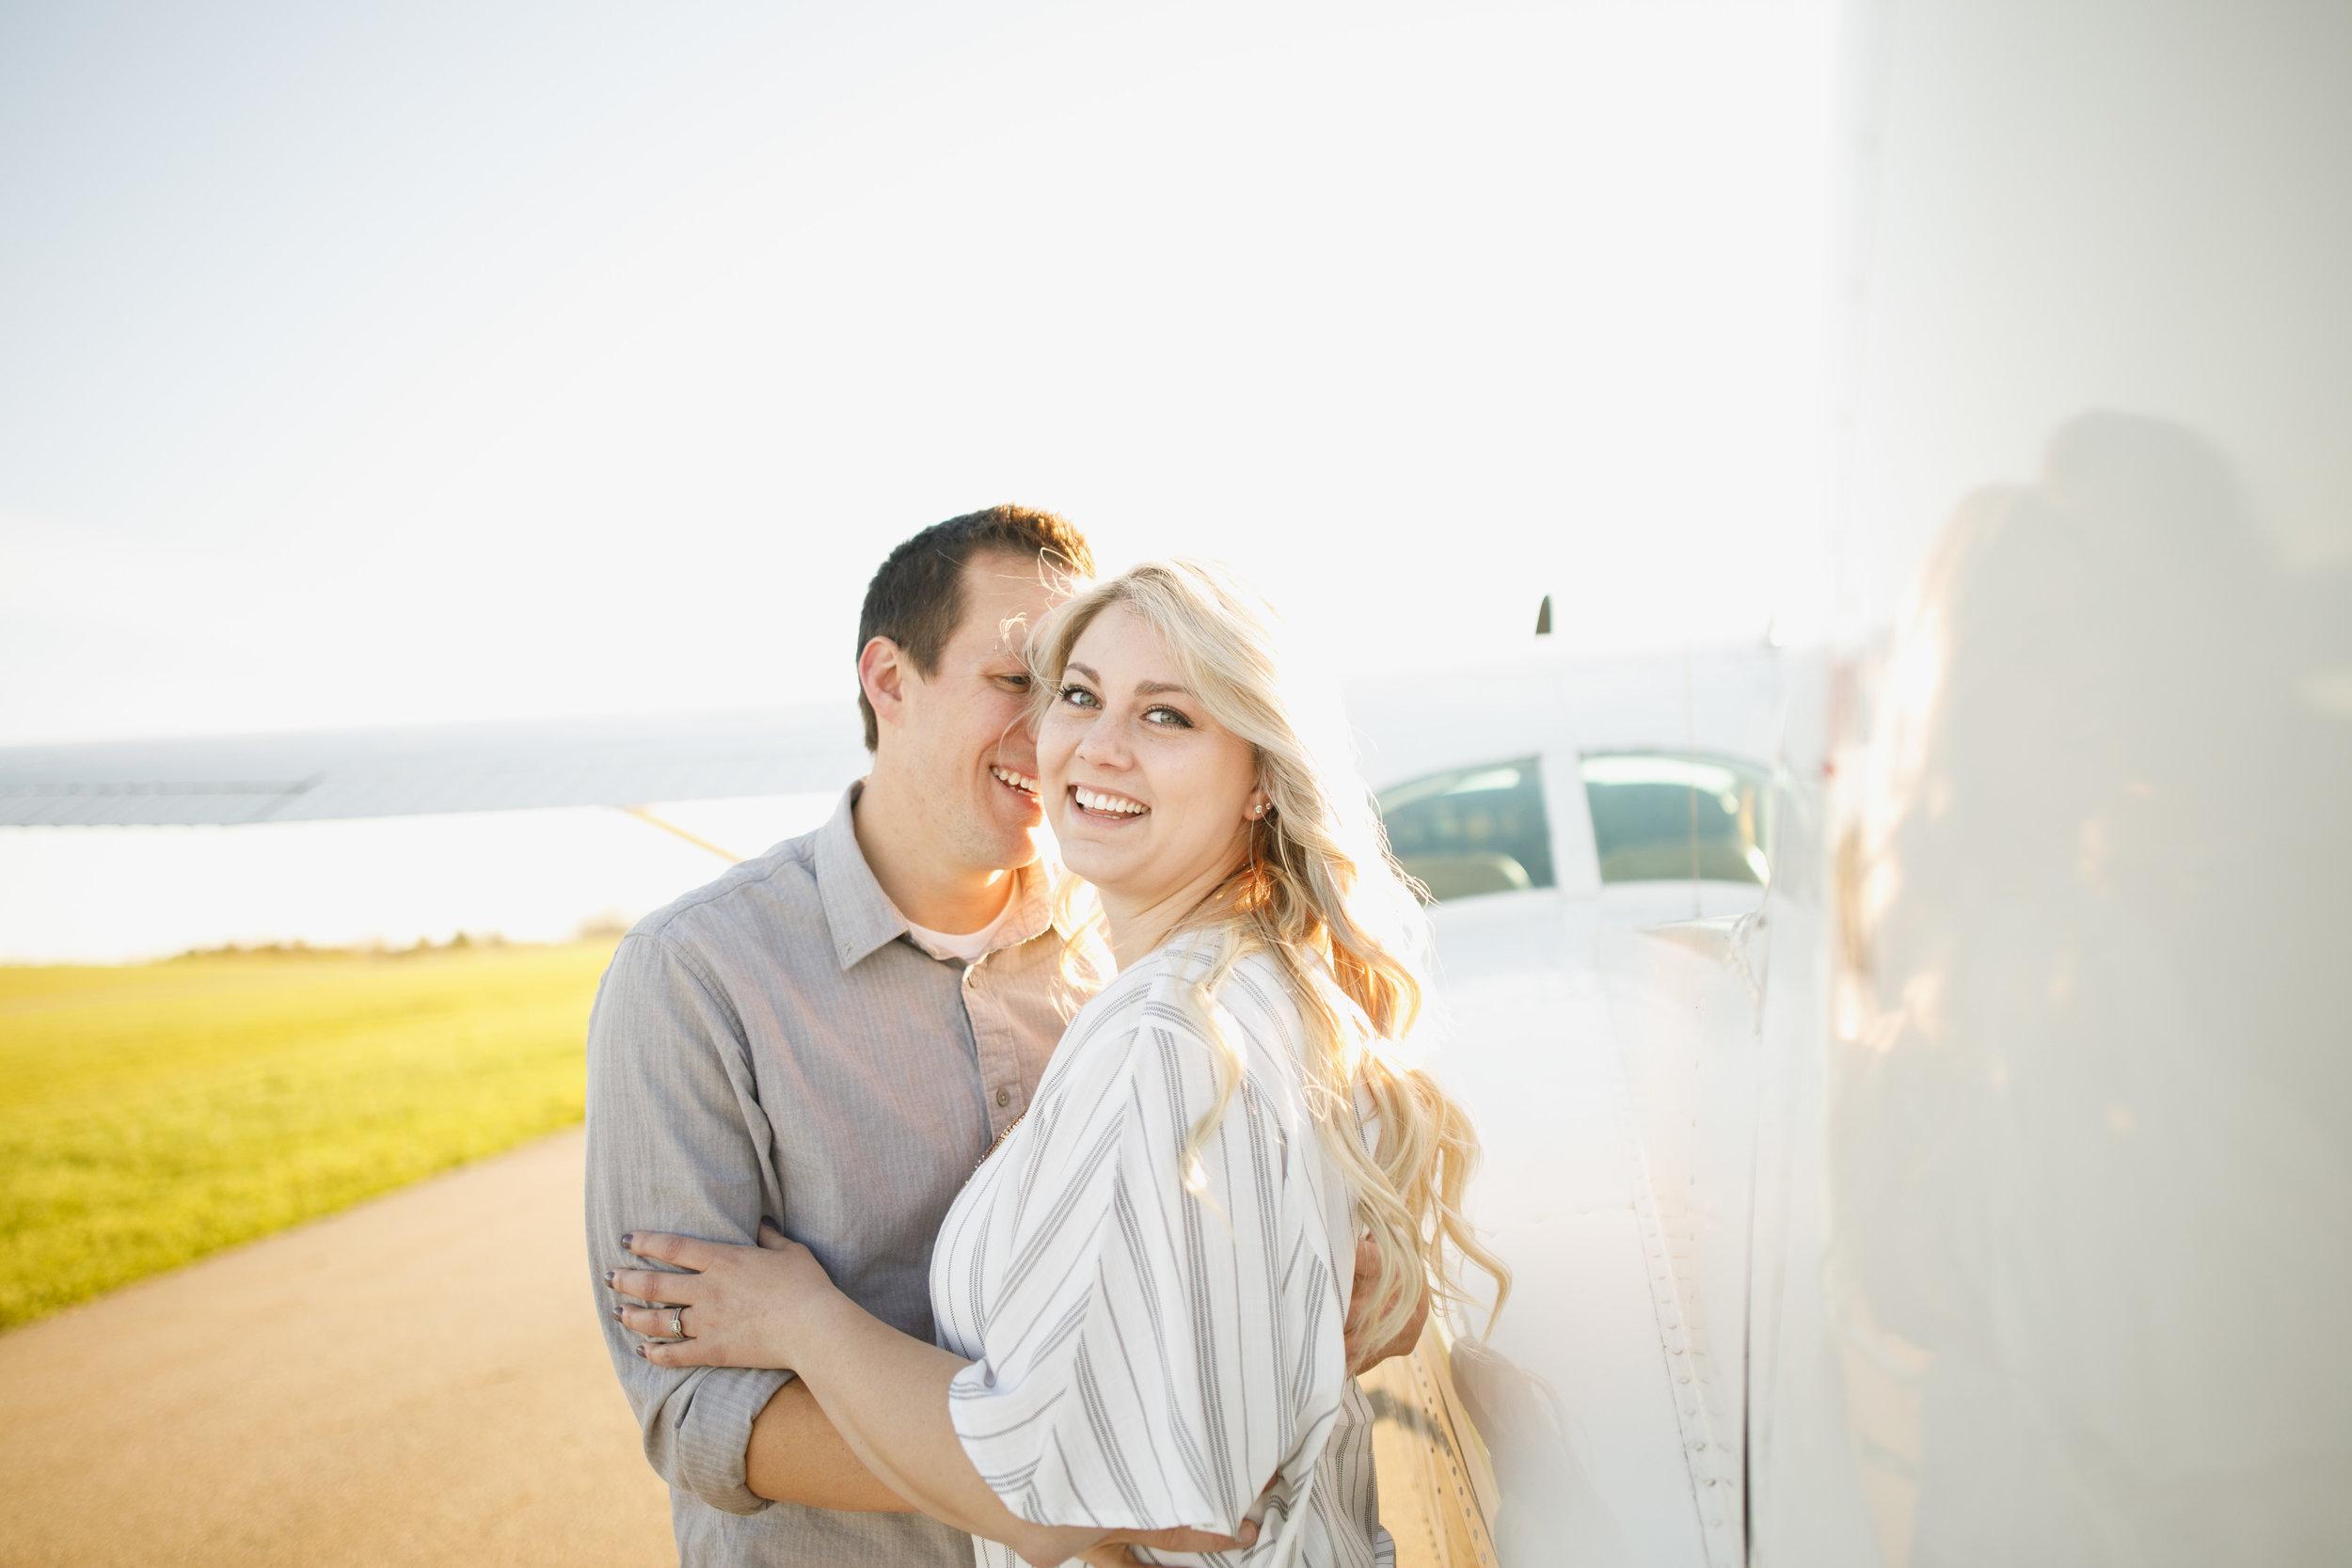 Grand Rapids Photographer - J Darling Photo - jessica darling - grand rapids wedding photographer - sparta airport - sparta michigan - jasmine and jeff engaged 023.jpg